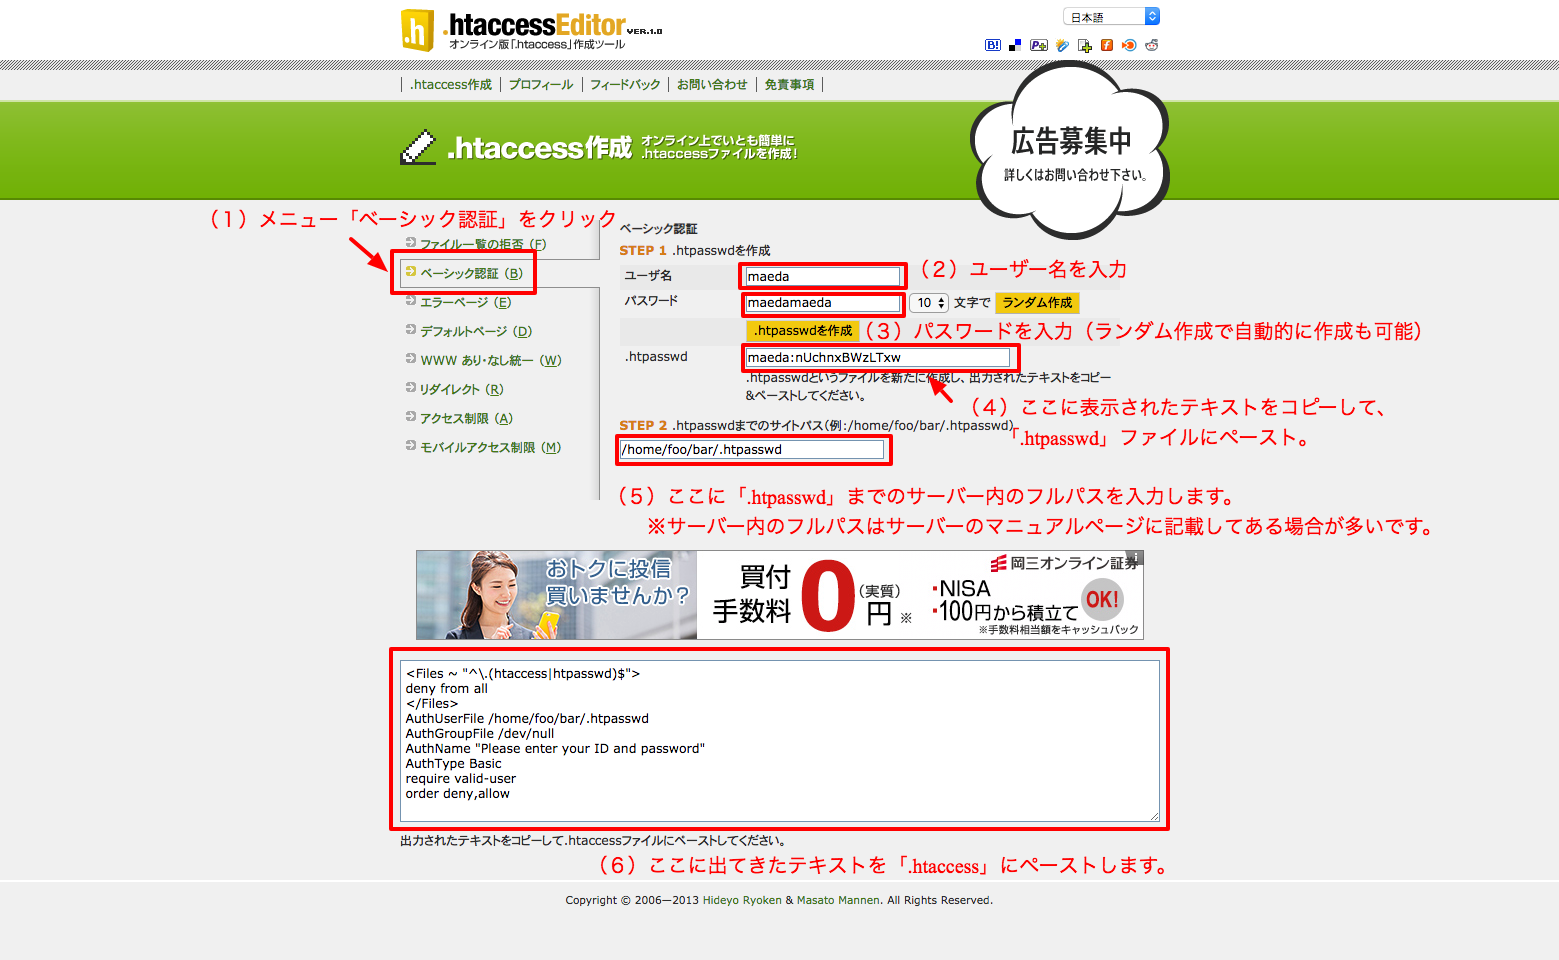 .htaccess ファイルを簡単作成「.htaccess Editor」ベーシック認証ファイルの作成方法